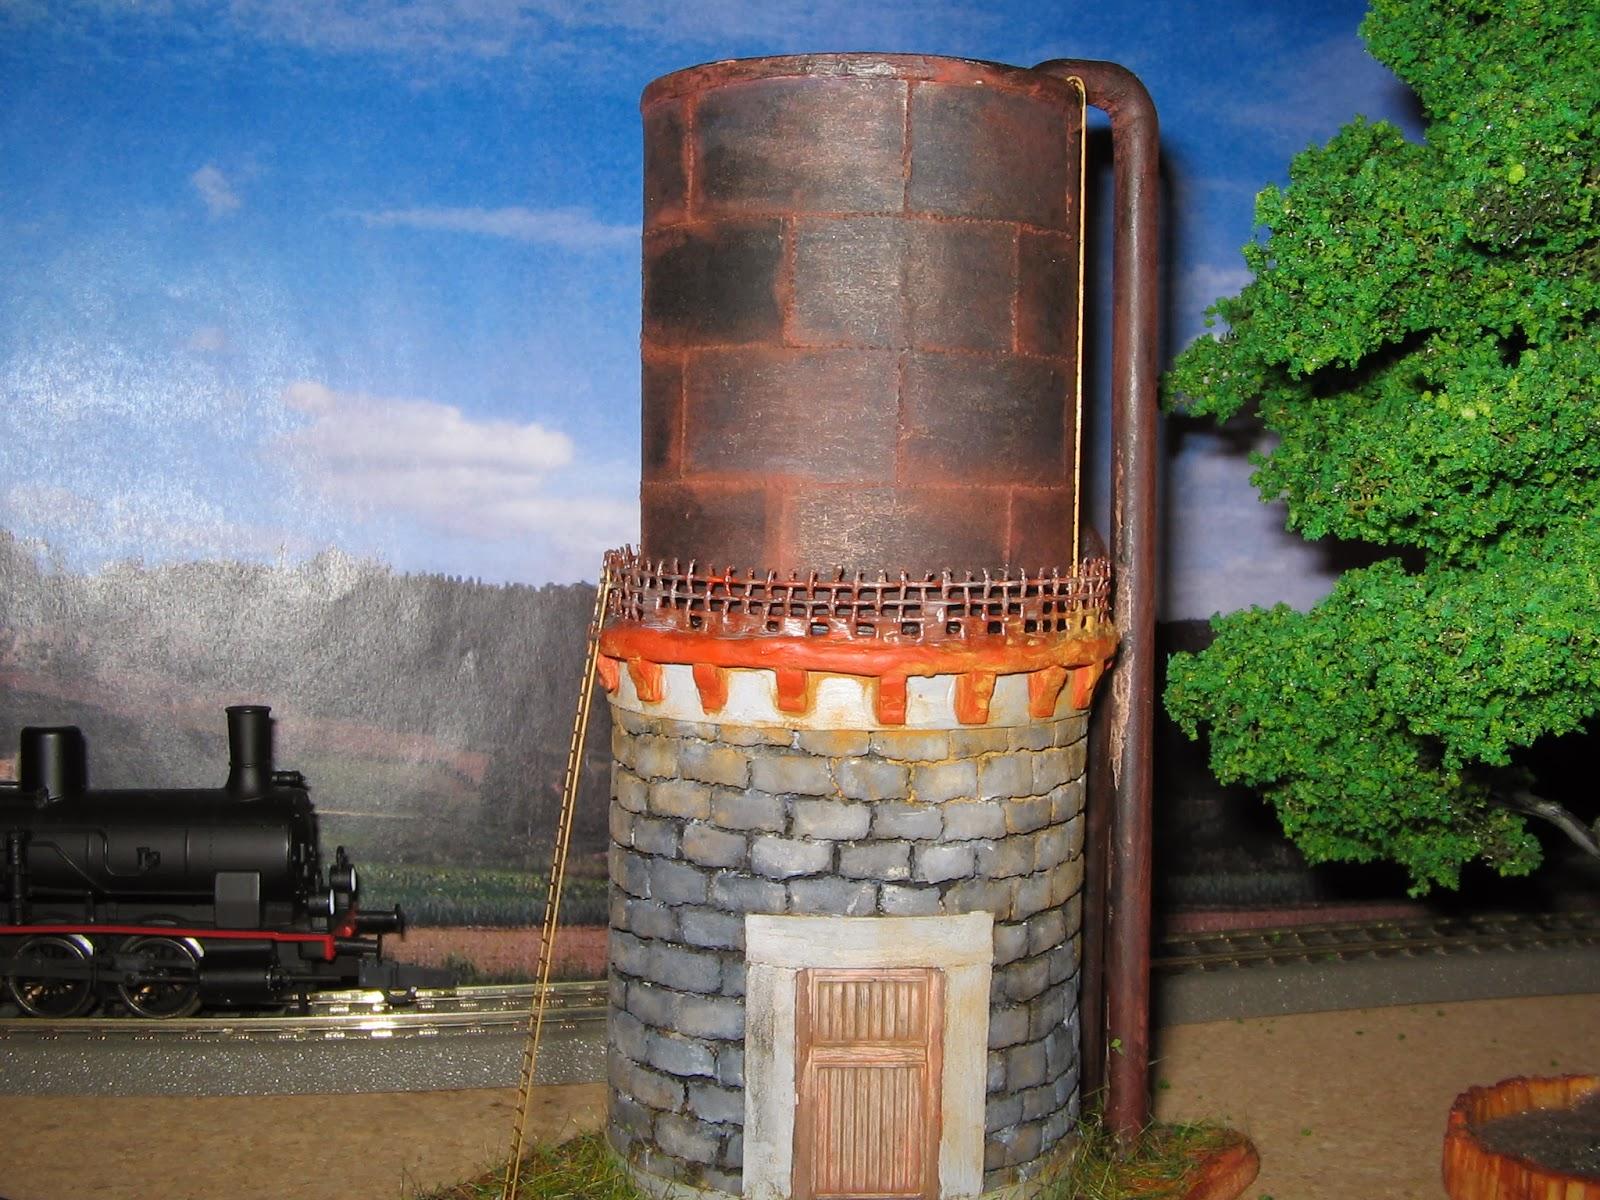 Treneslonginos deposito de agua - Depositos de agua ...